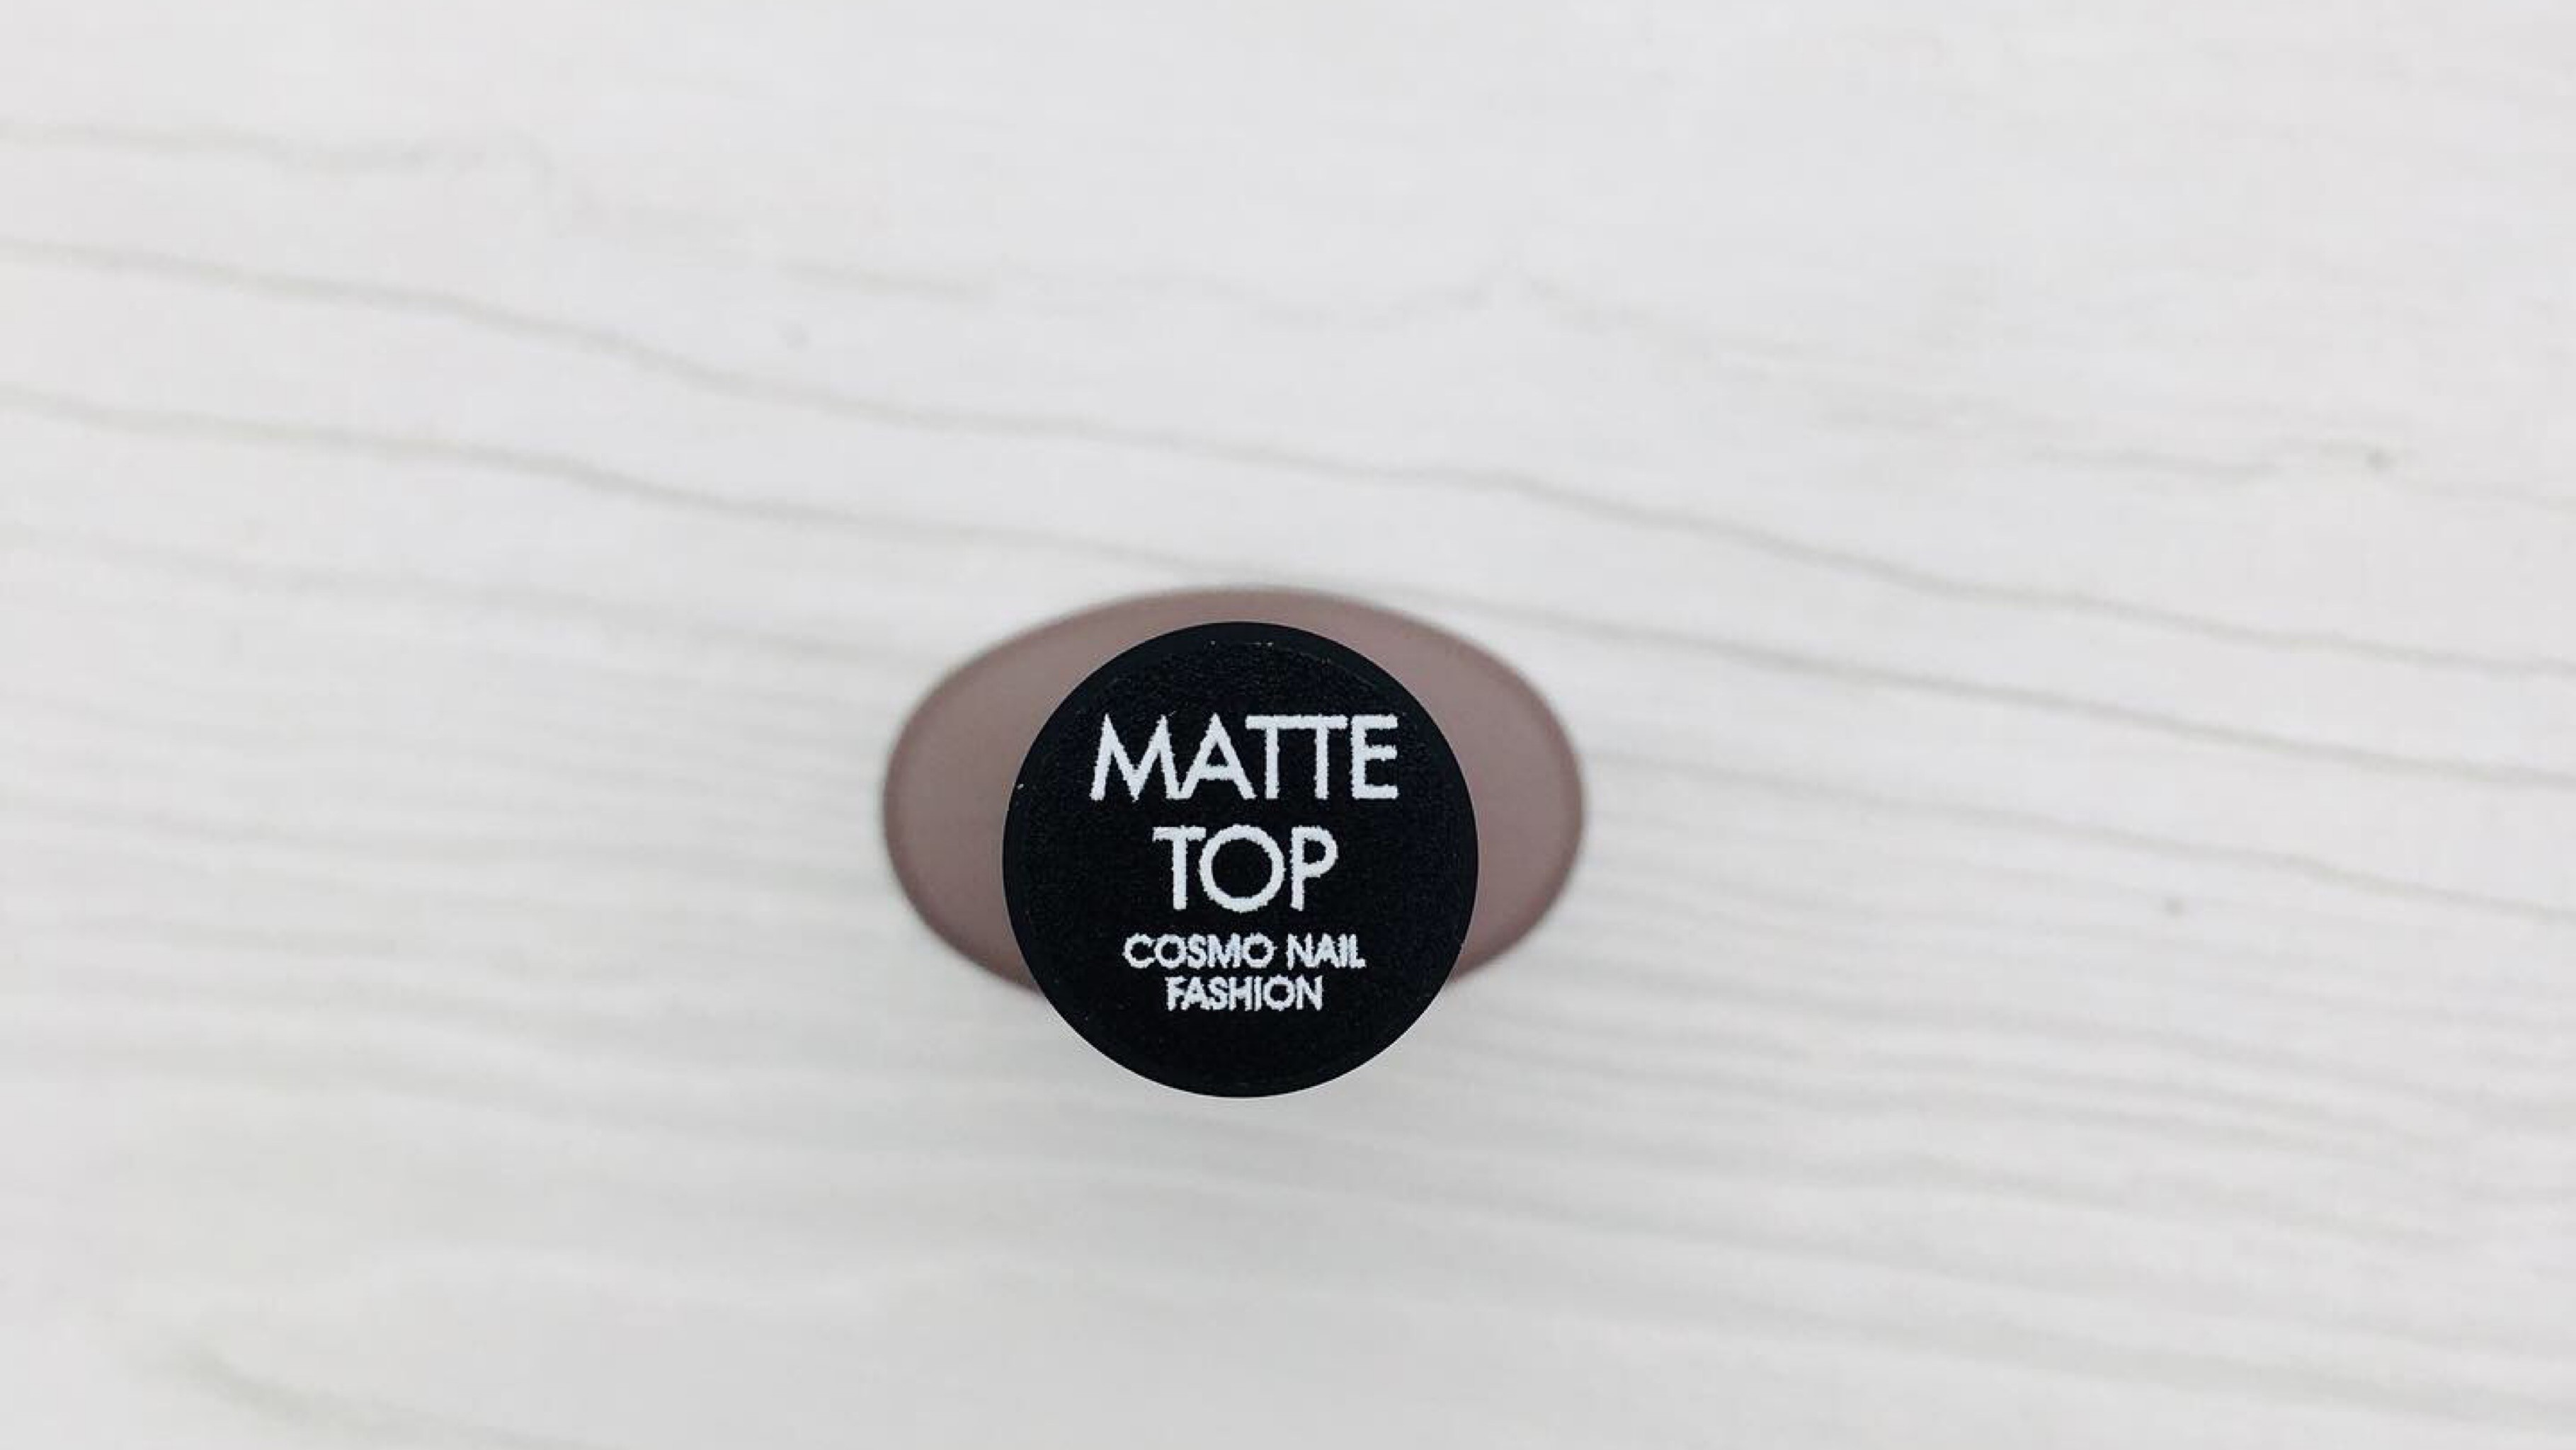 Матовый топ Cosmo Nail Fashion